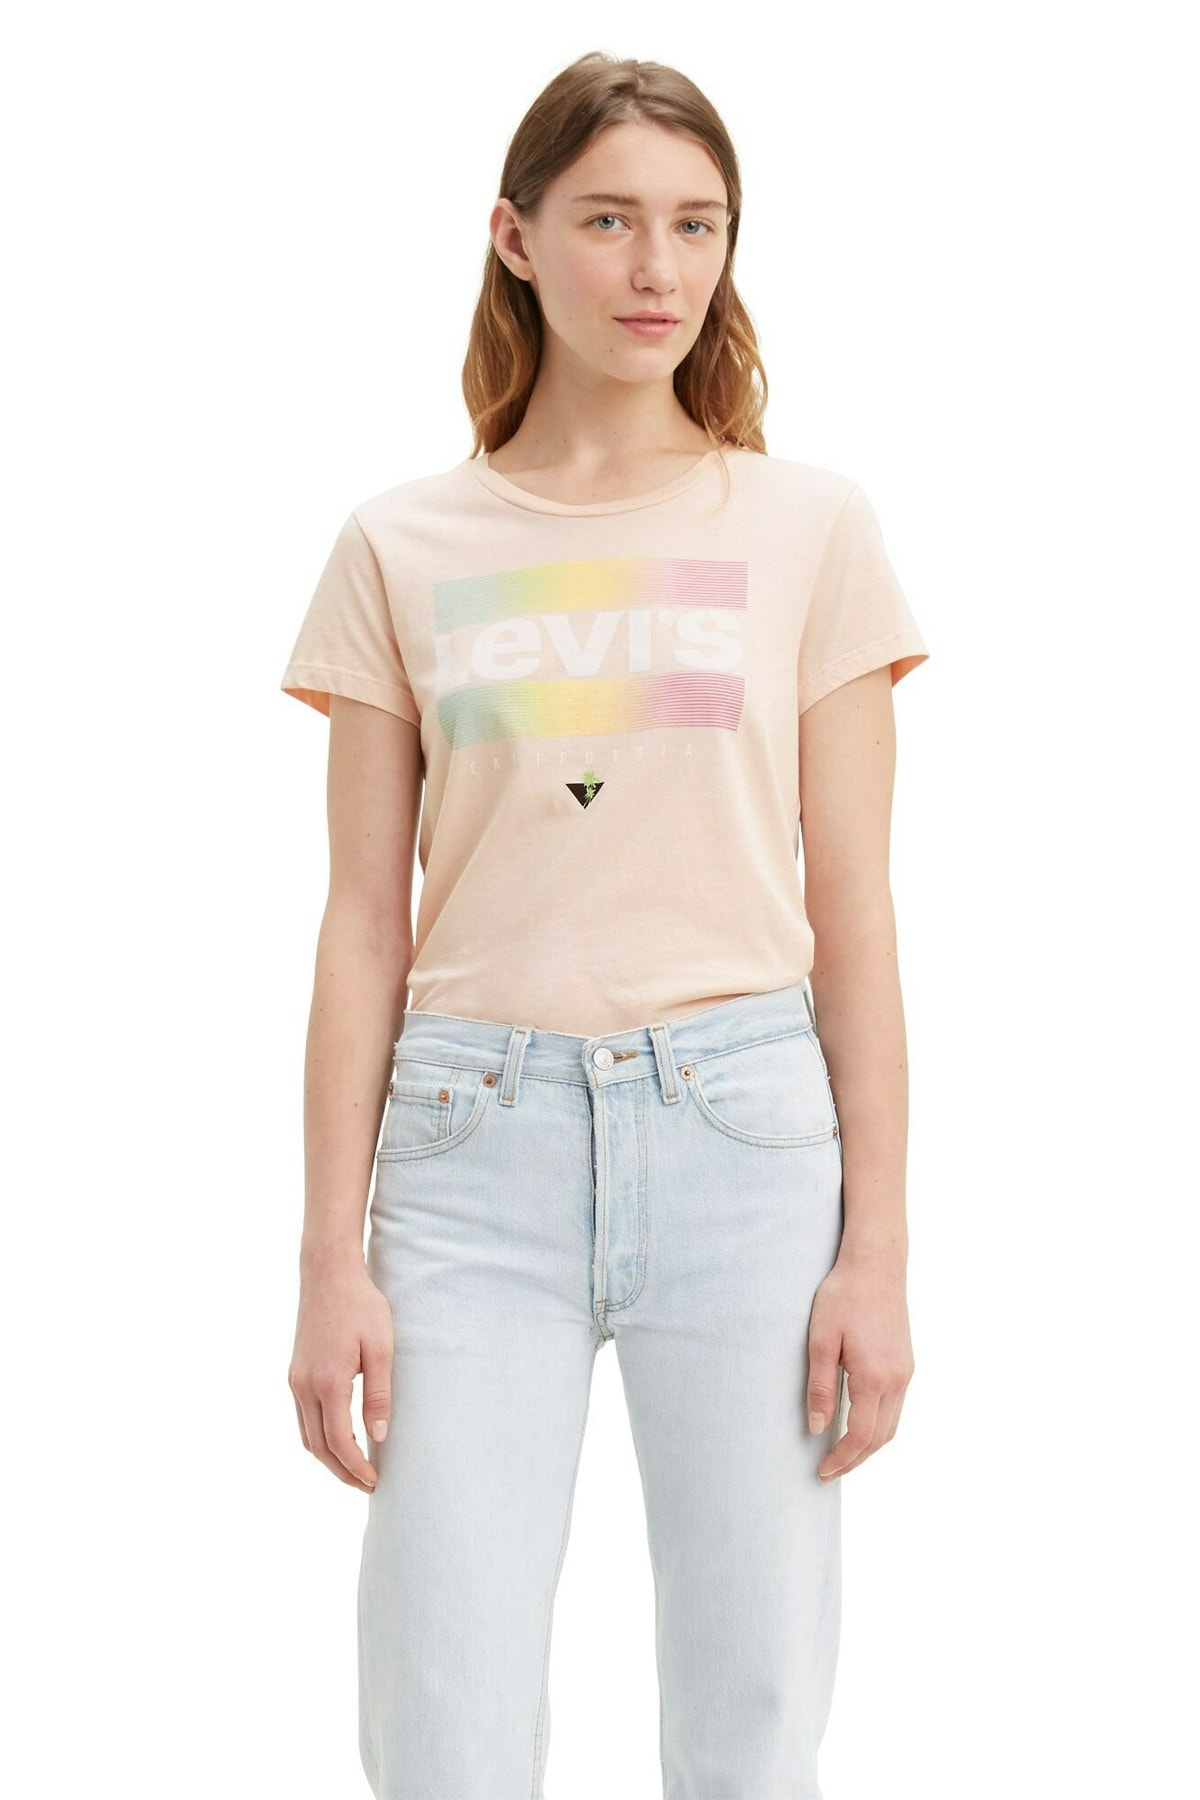 Levi's Kadın Pembe The Perfect T-shirt 17369-0832 1